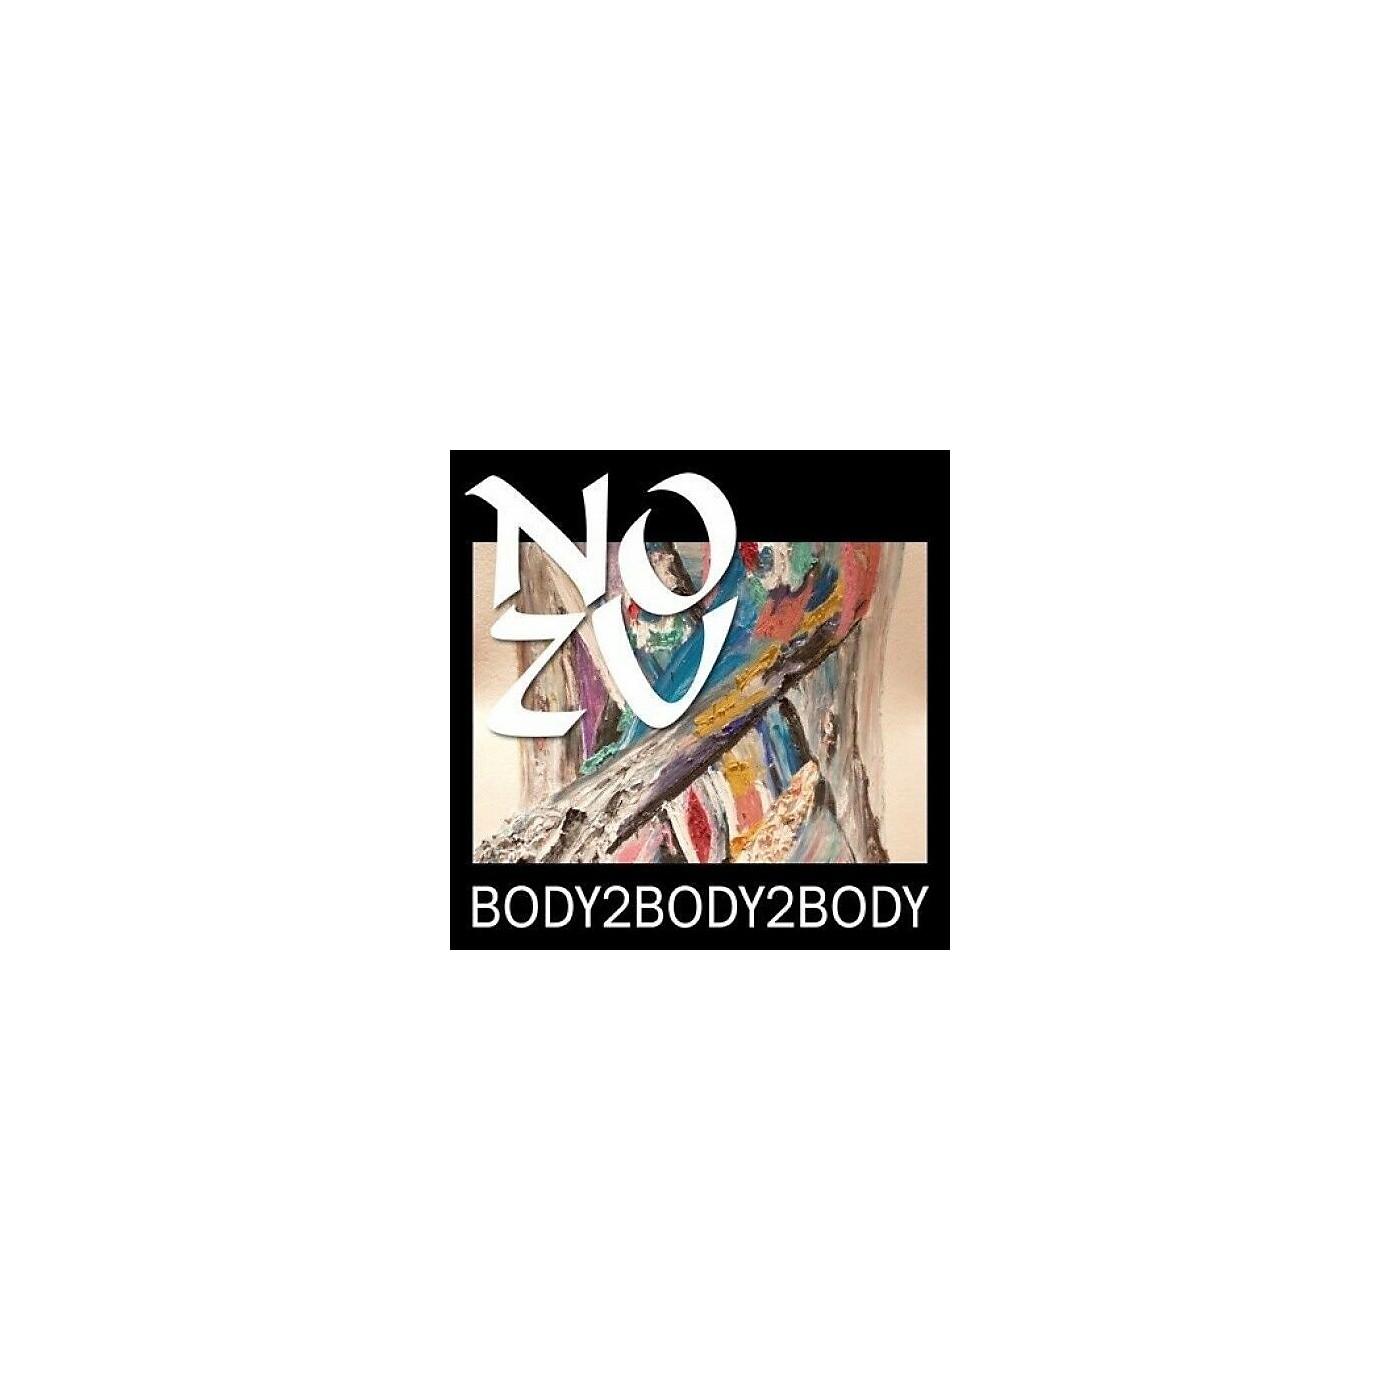 Alliance No Zu - Body2Body2Body thumbnail